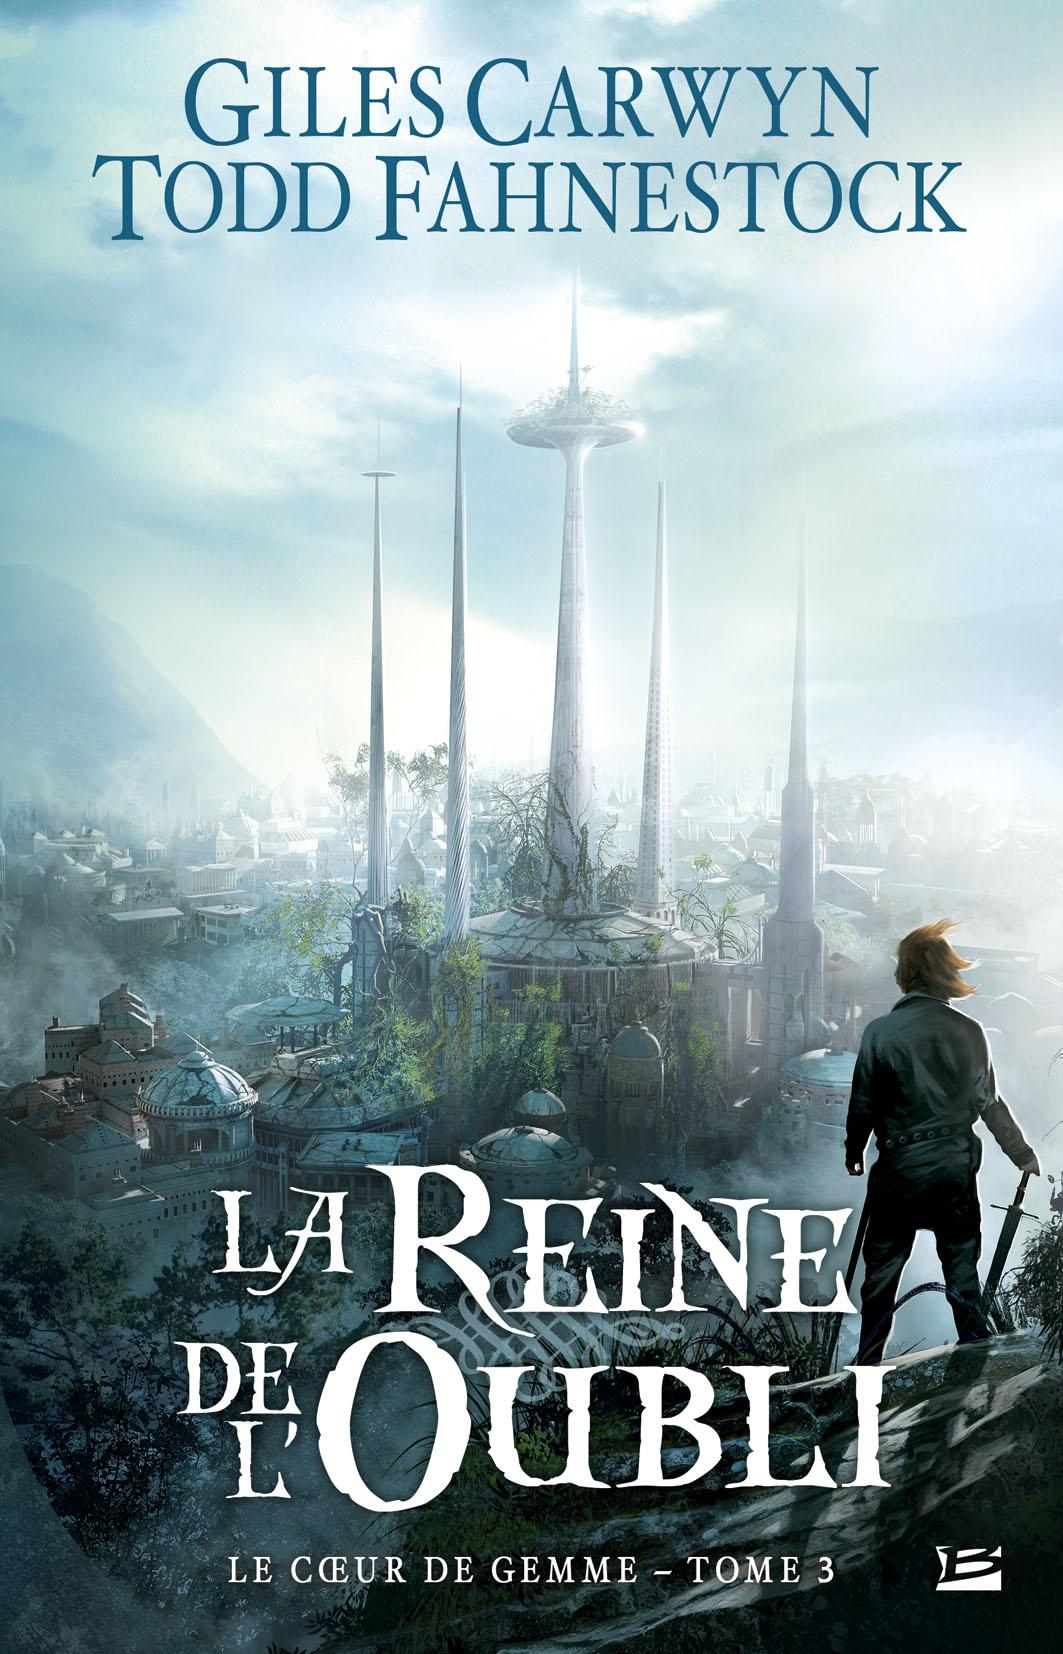 http://ressources.bragelonne.fr/img/livres/2012-01/9782352945505_org.jpg